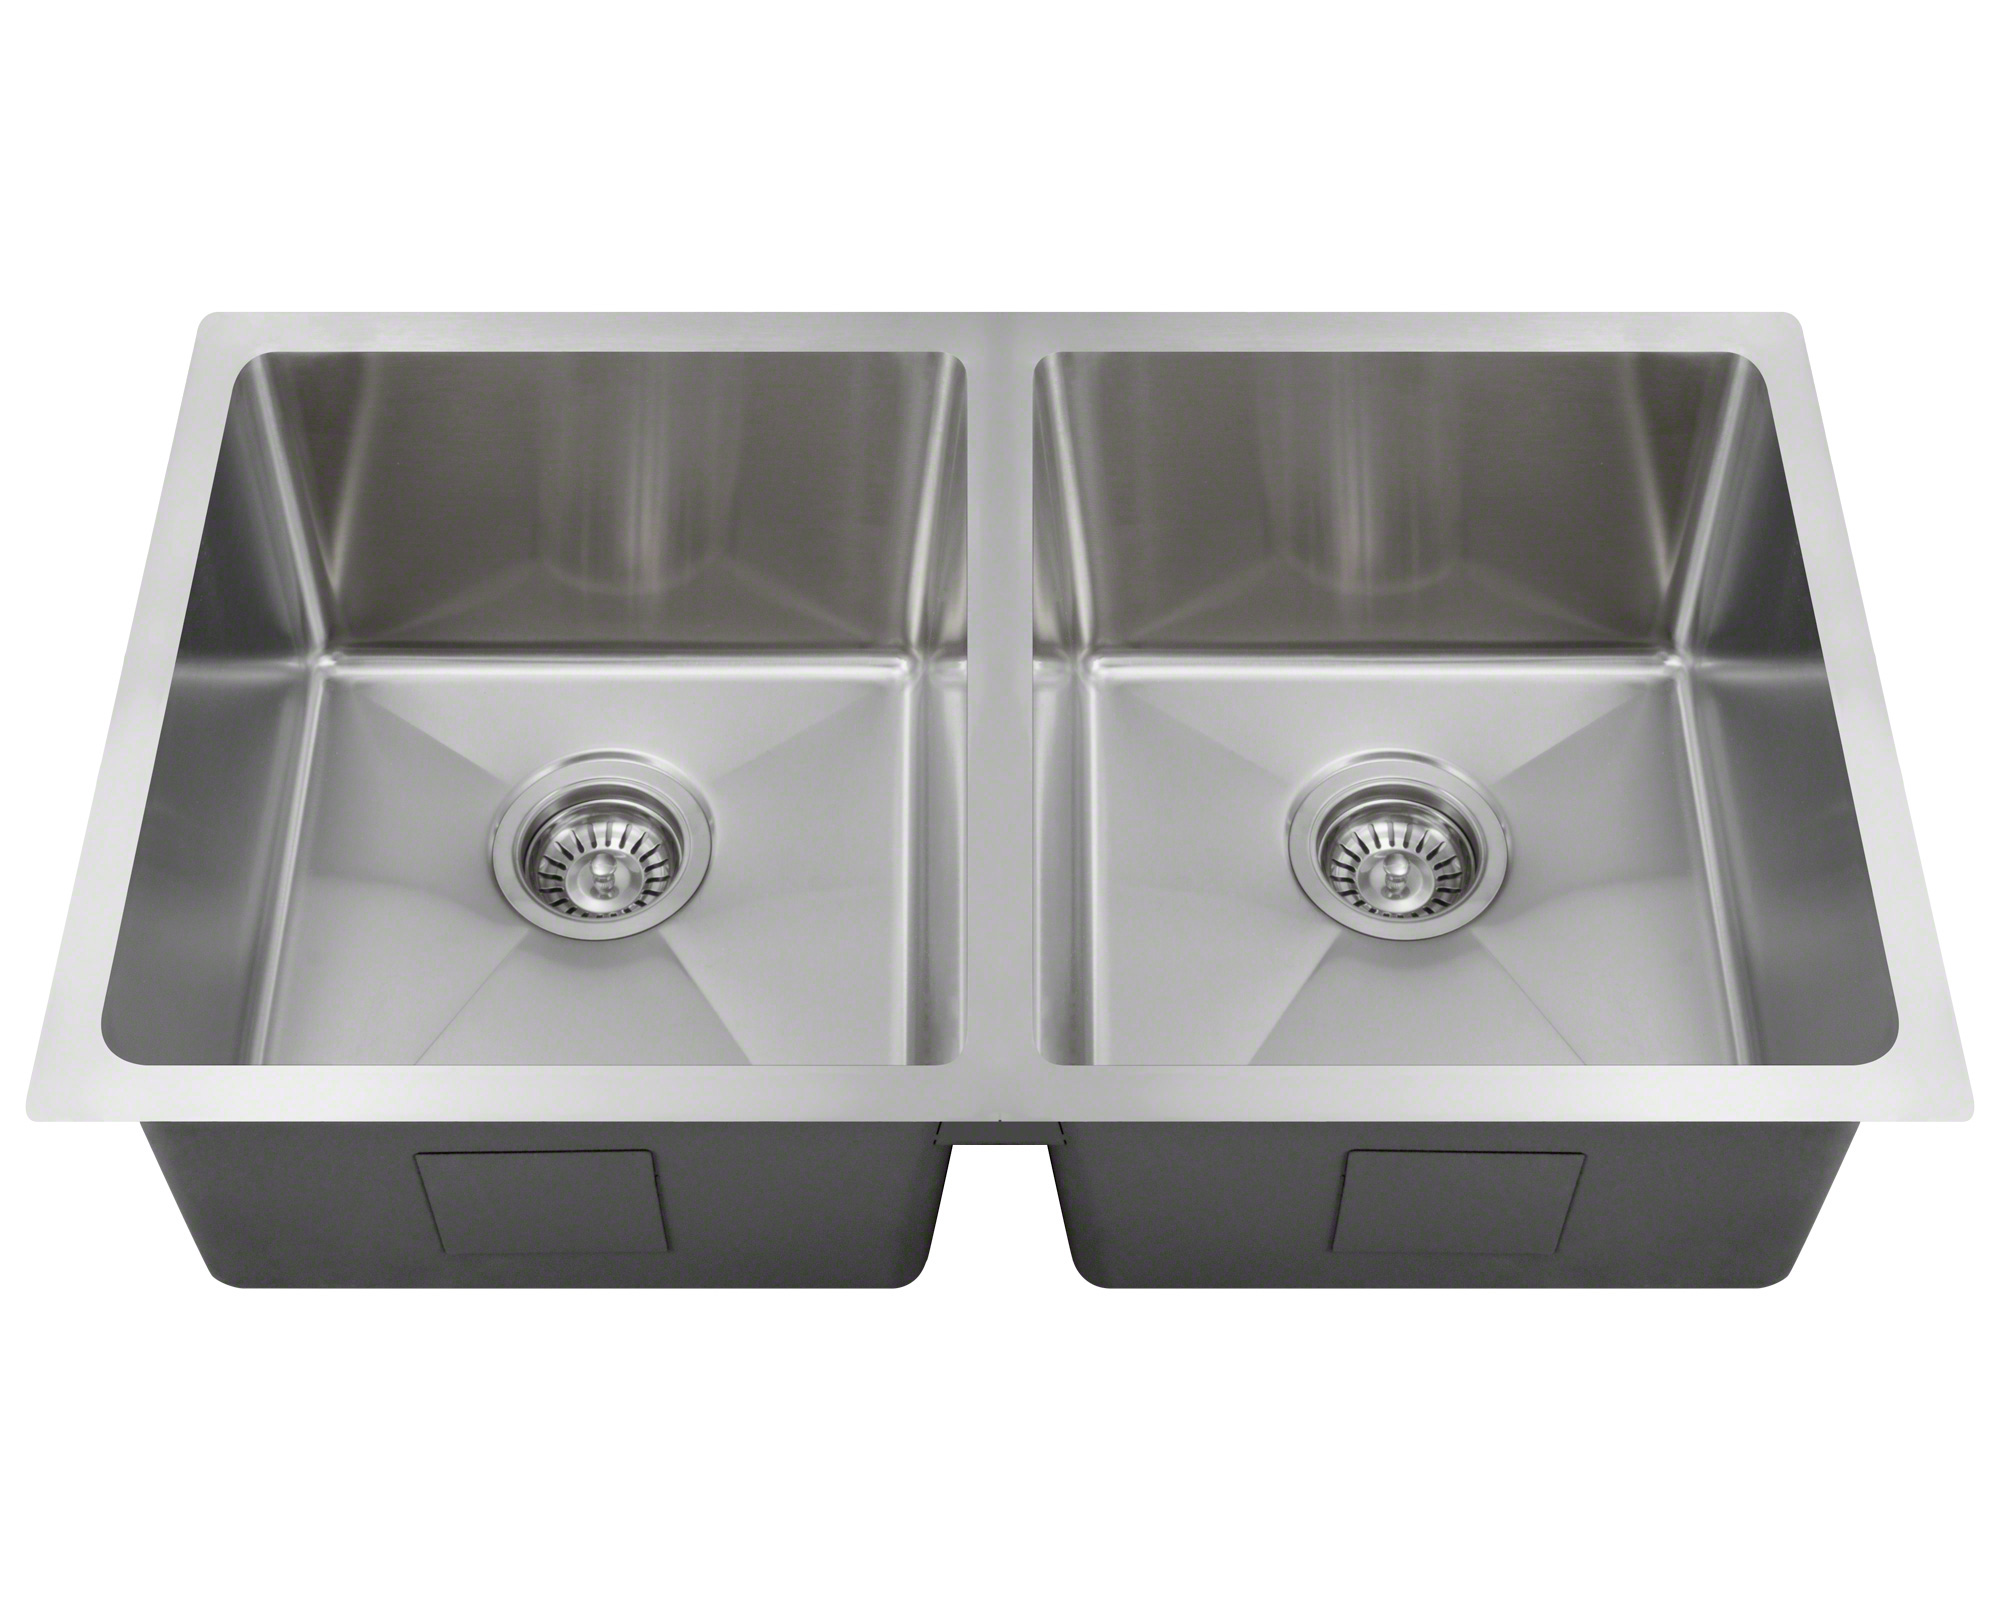 "Polaris PD0213 Undermount Double Bowl 3/4"" Radius Stainless Steel Kitchen Sink"